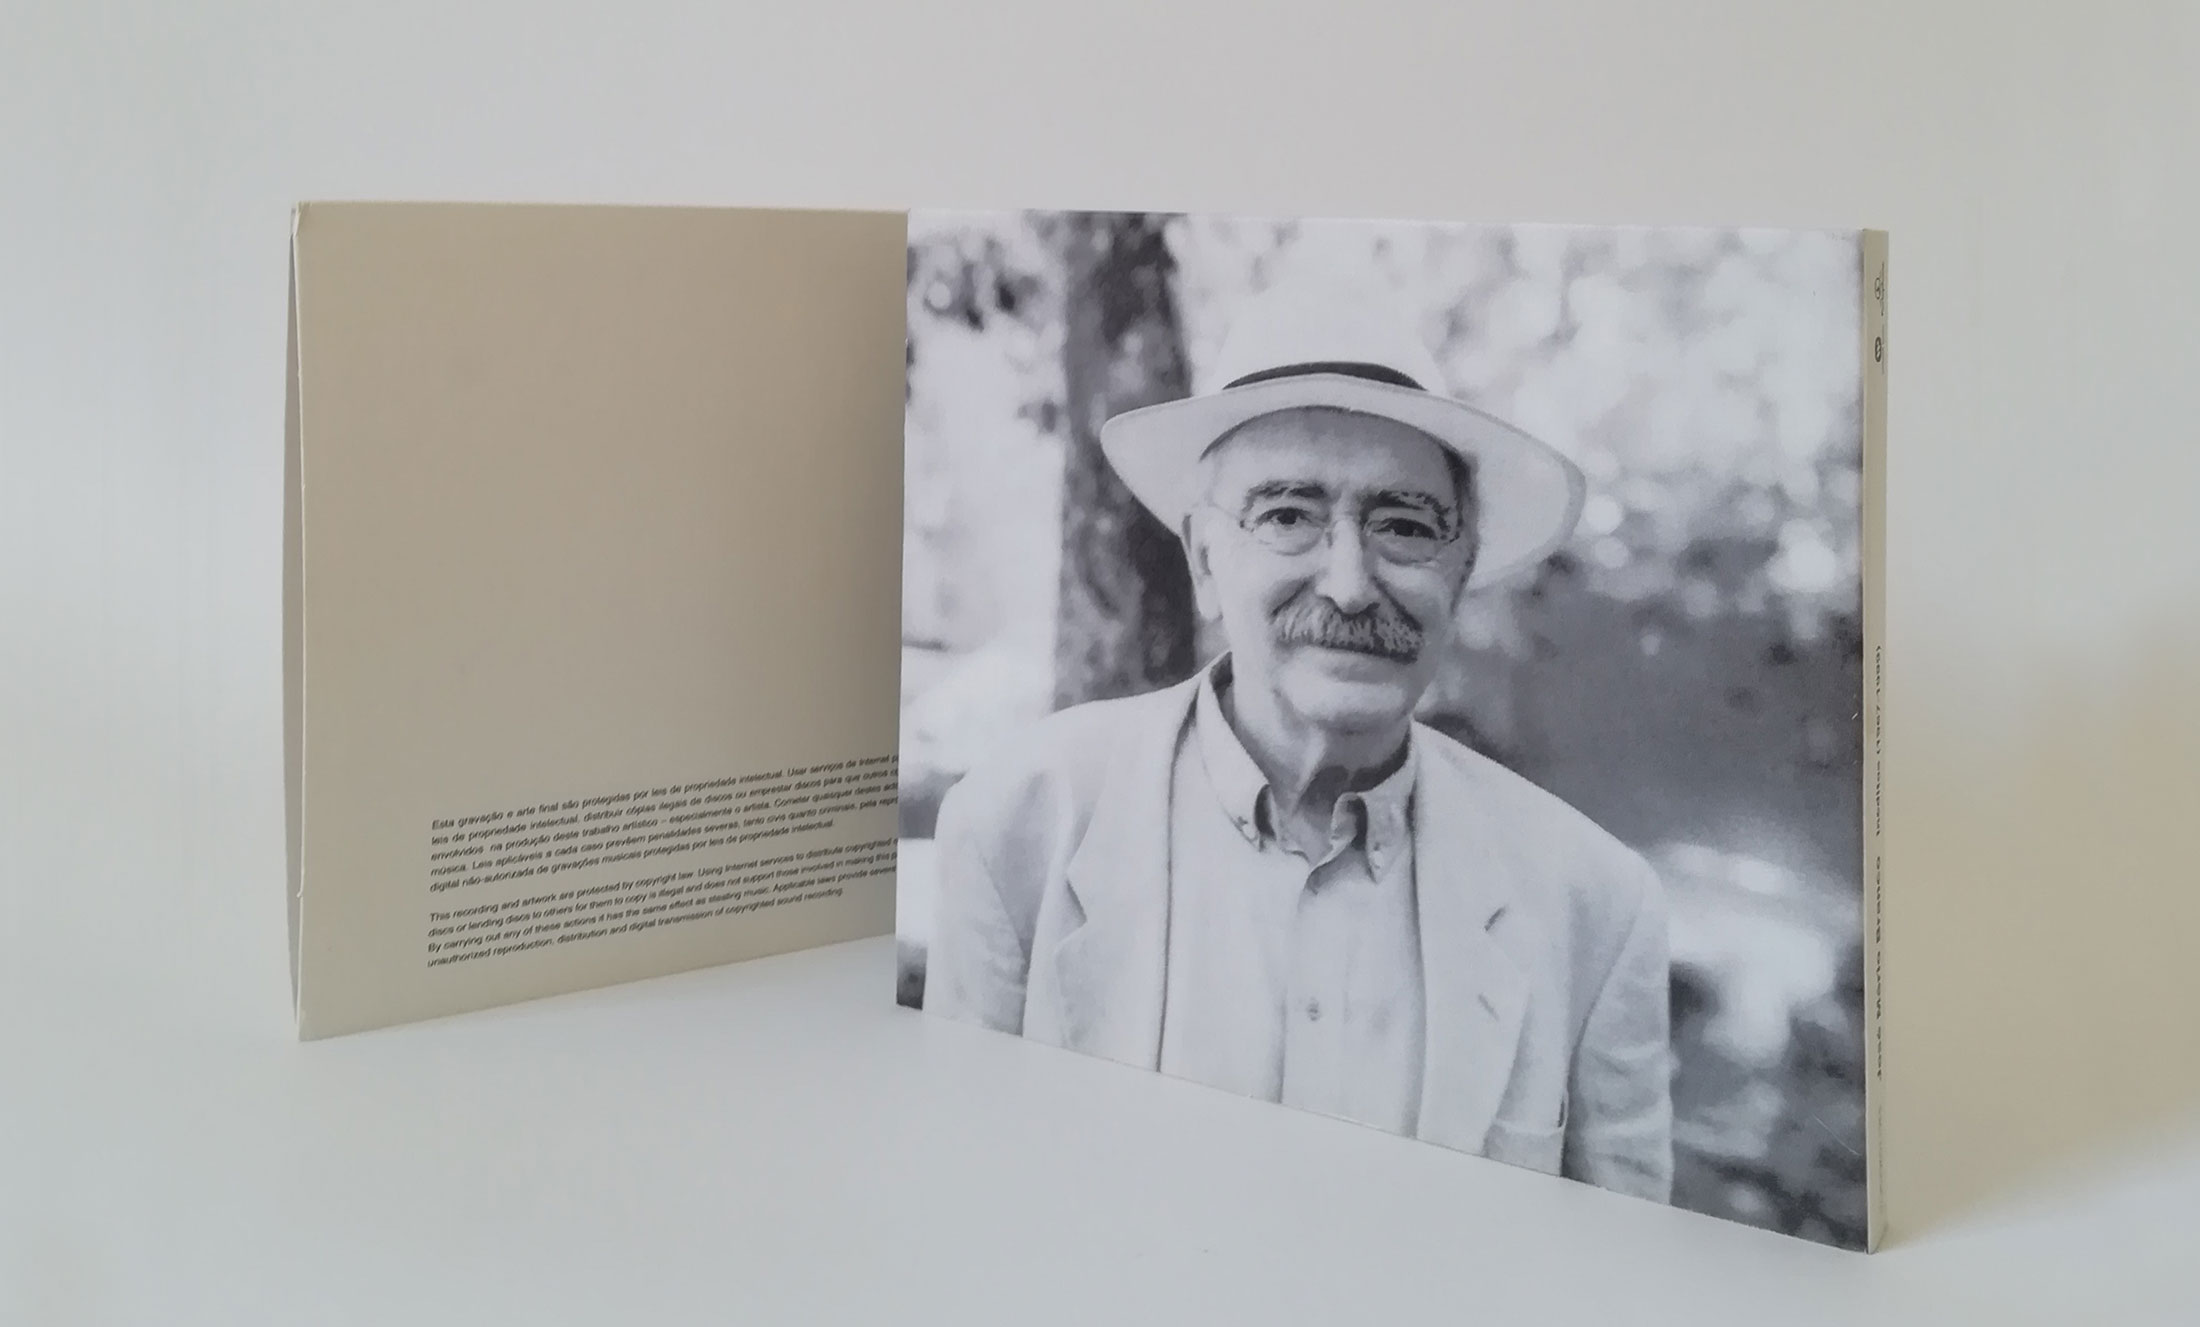 José Mário Branco - Inéditos 1967-1999 (cd1 e cd 2)